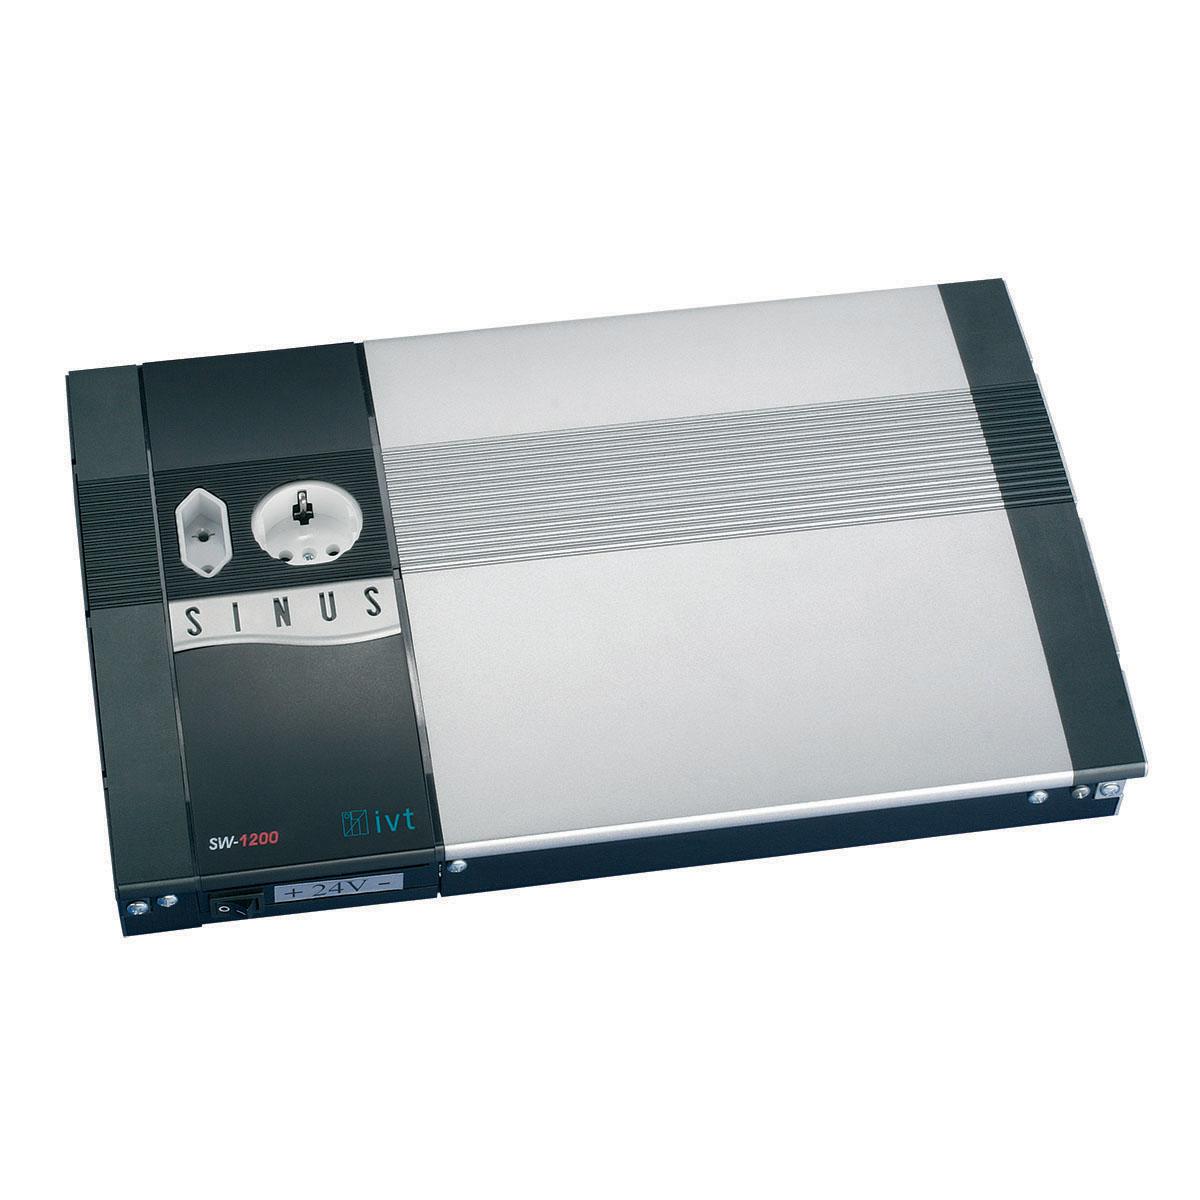 IVT Passendes Anschlusskabel 25mm/² 1m